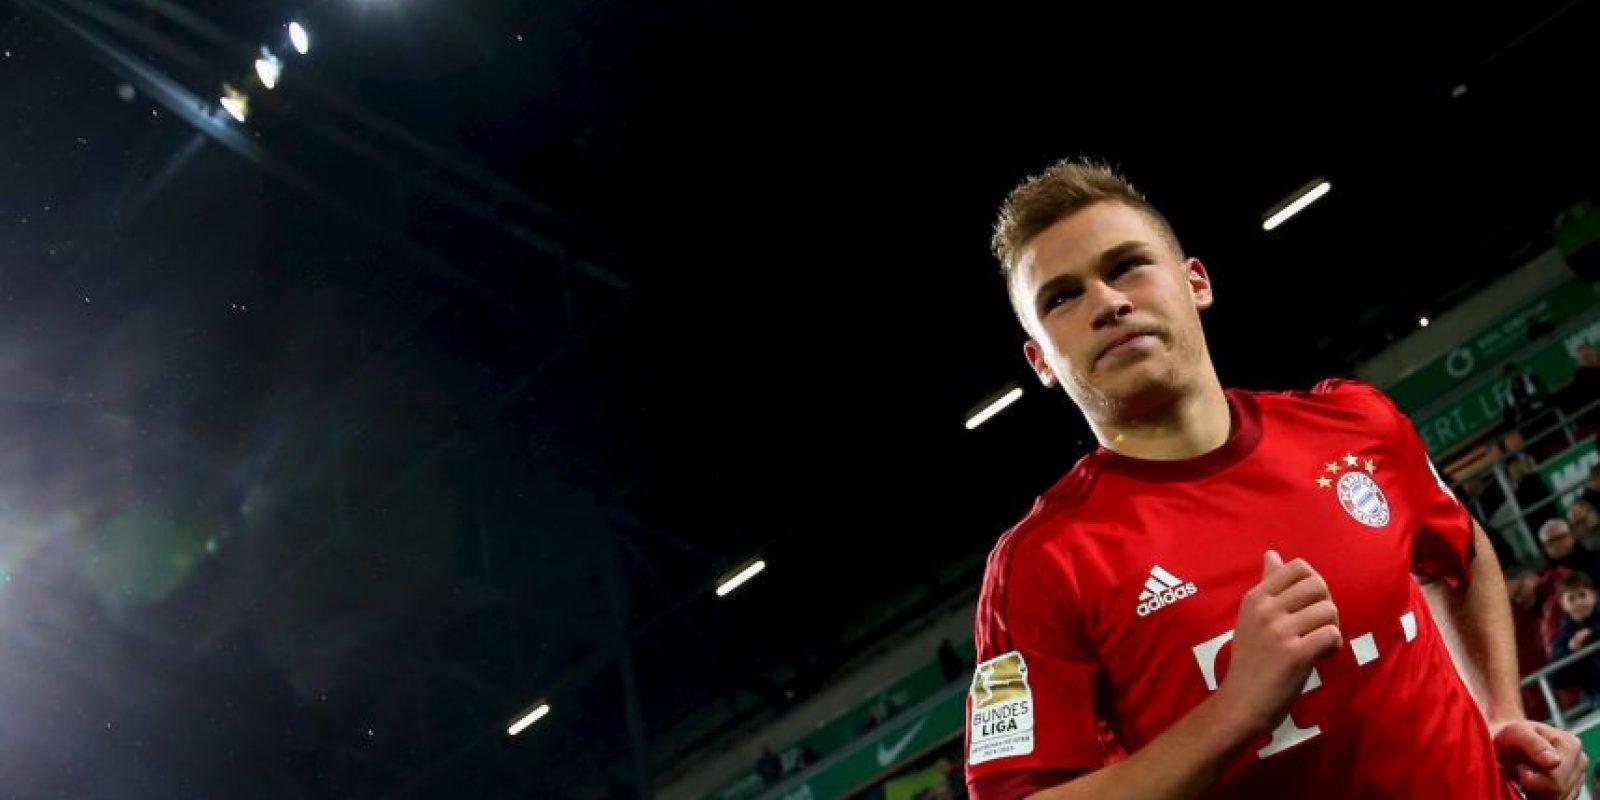 Llegó al Bayern Munich en la campaña 2015/2016. Foto:Getty Images